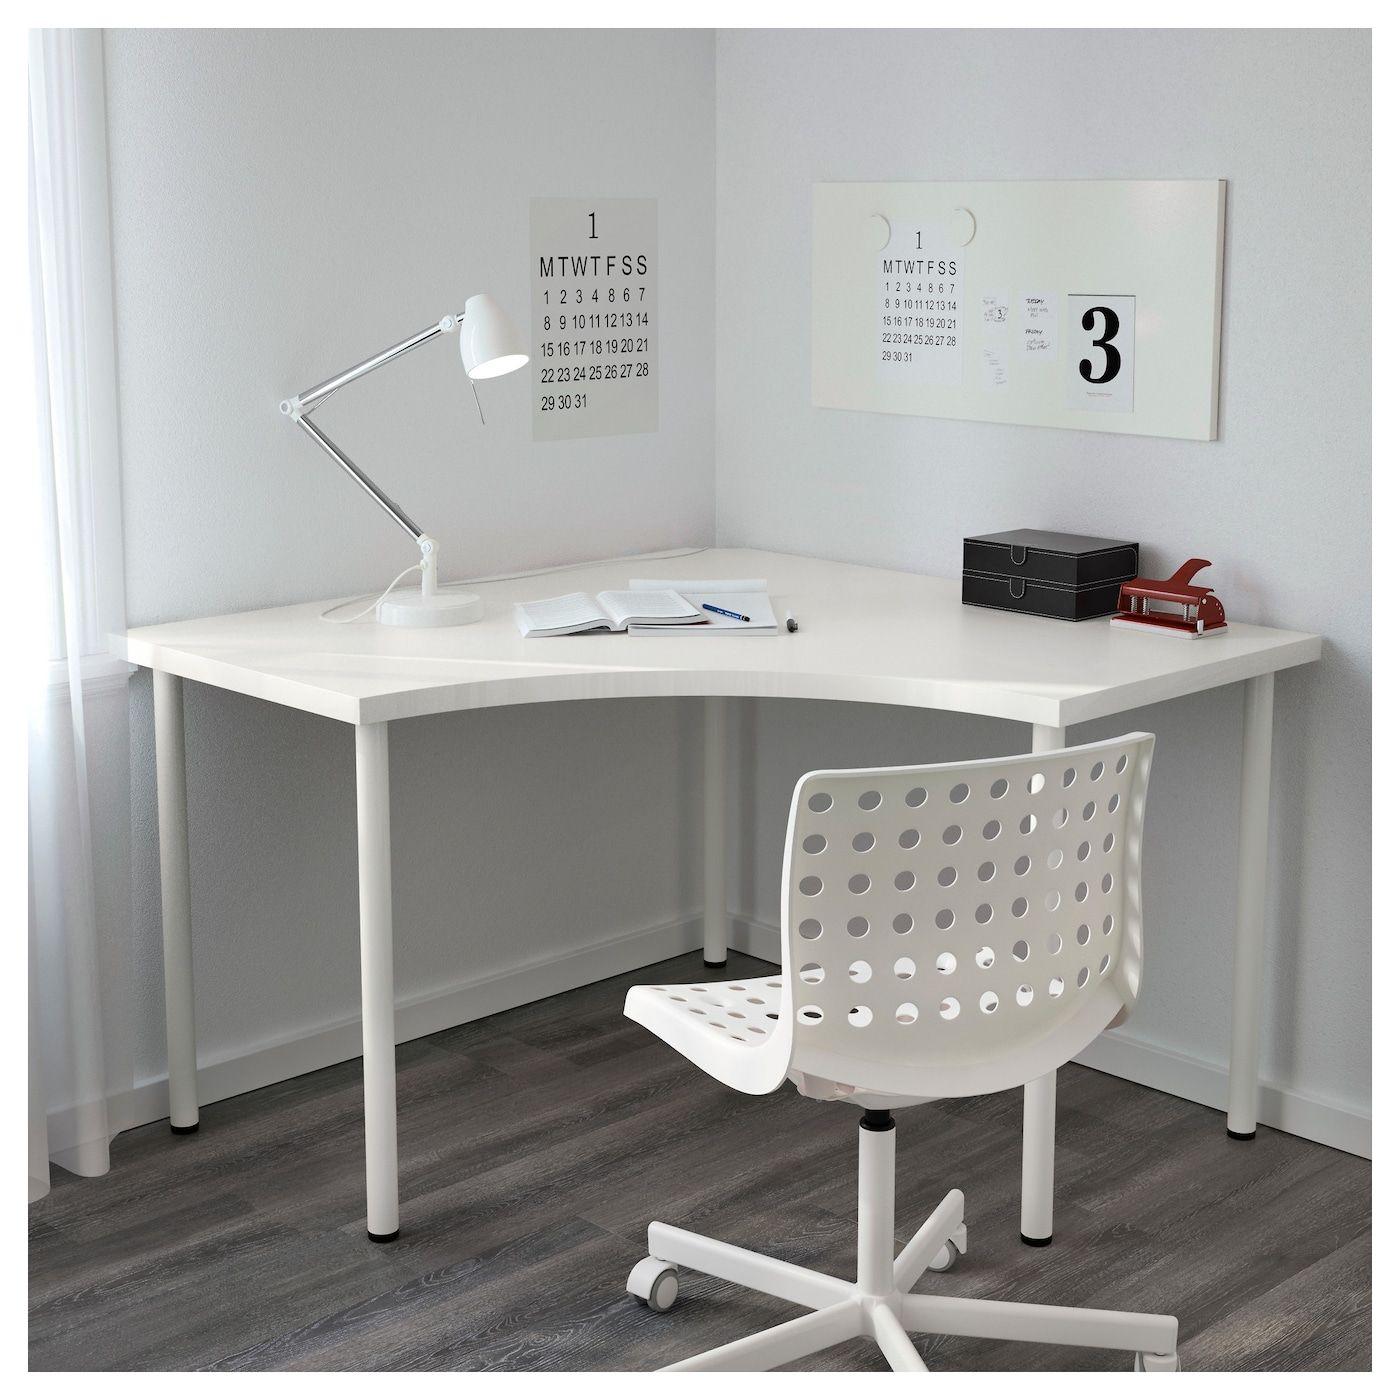 Linnmon Corner Table Top White 47 1 4x47 1 4 Corner Table